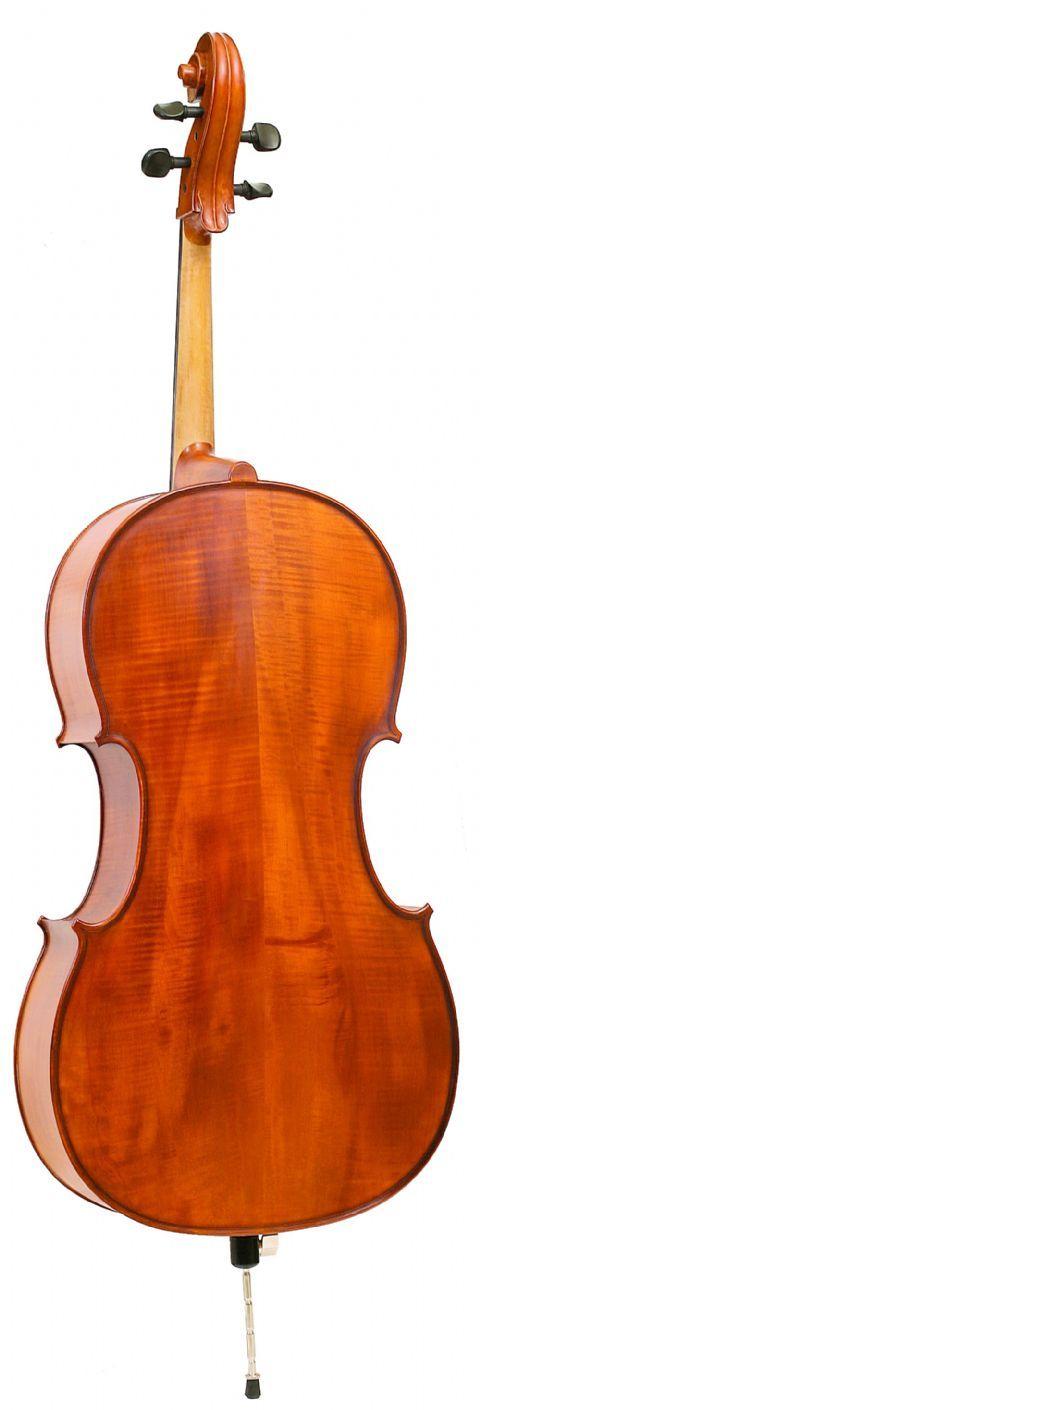 Violonchelo 7/8 - 4/4 GLIGA modelo GENIAL I Antiqued